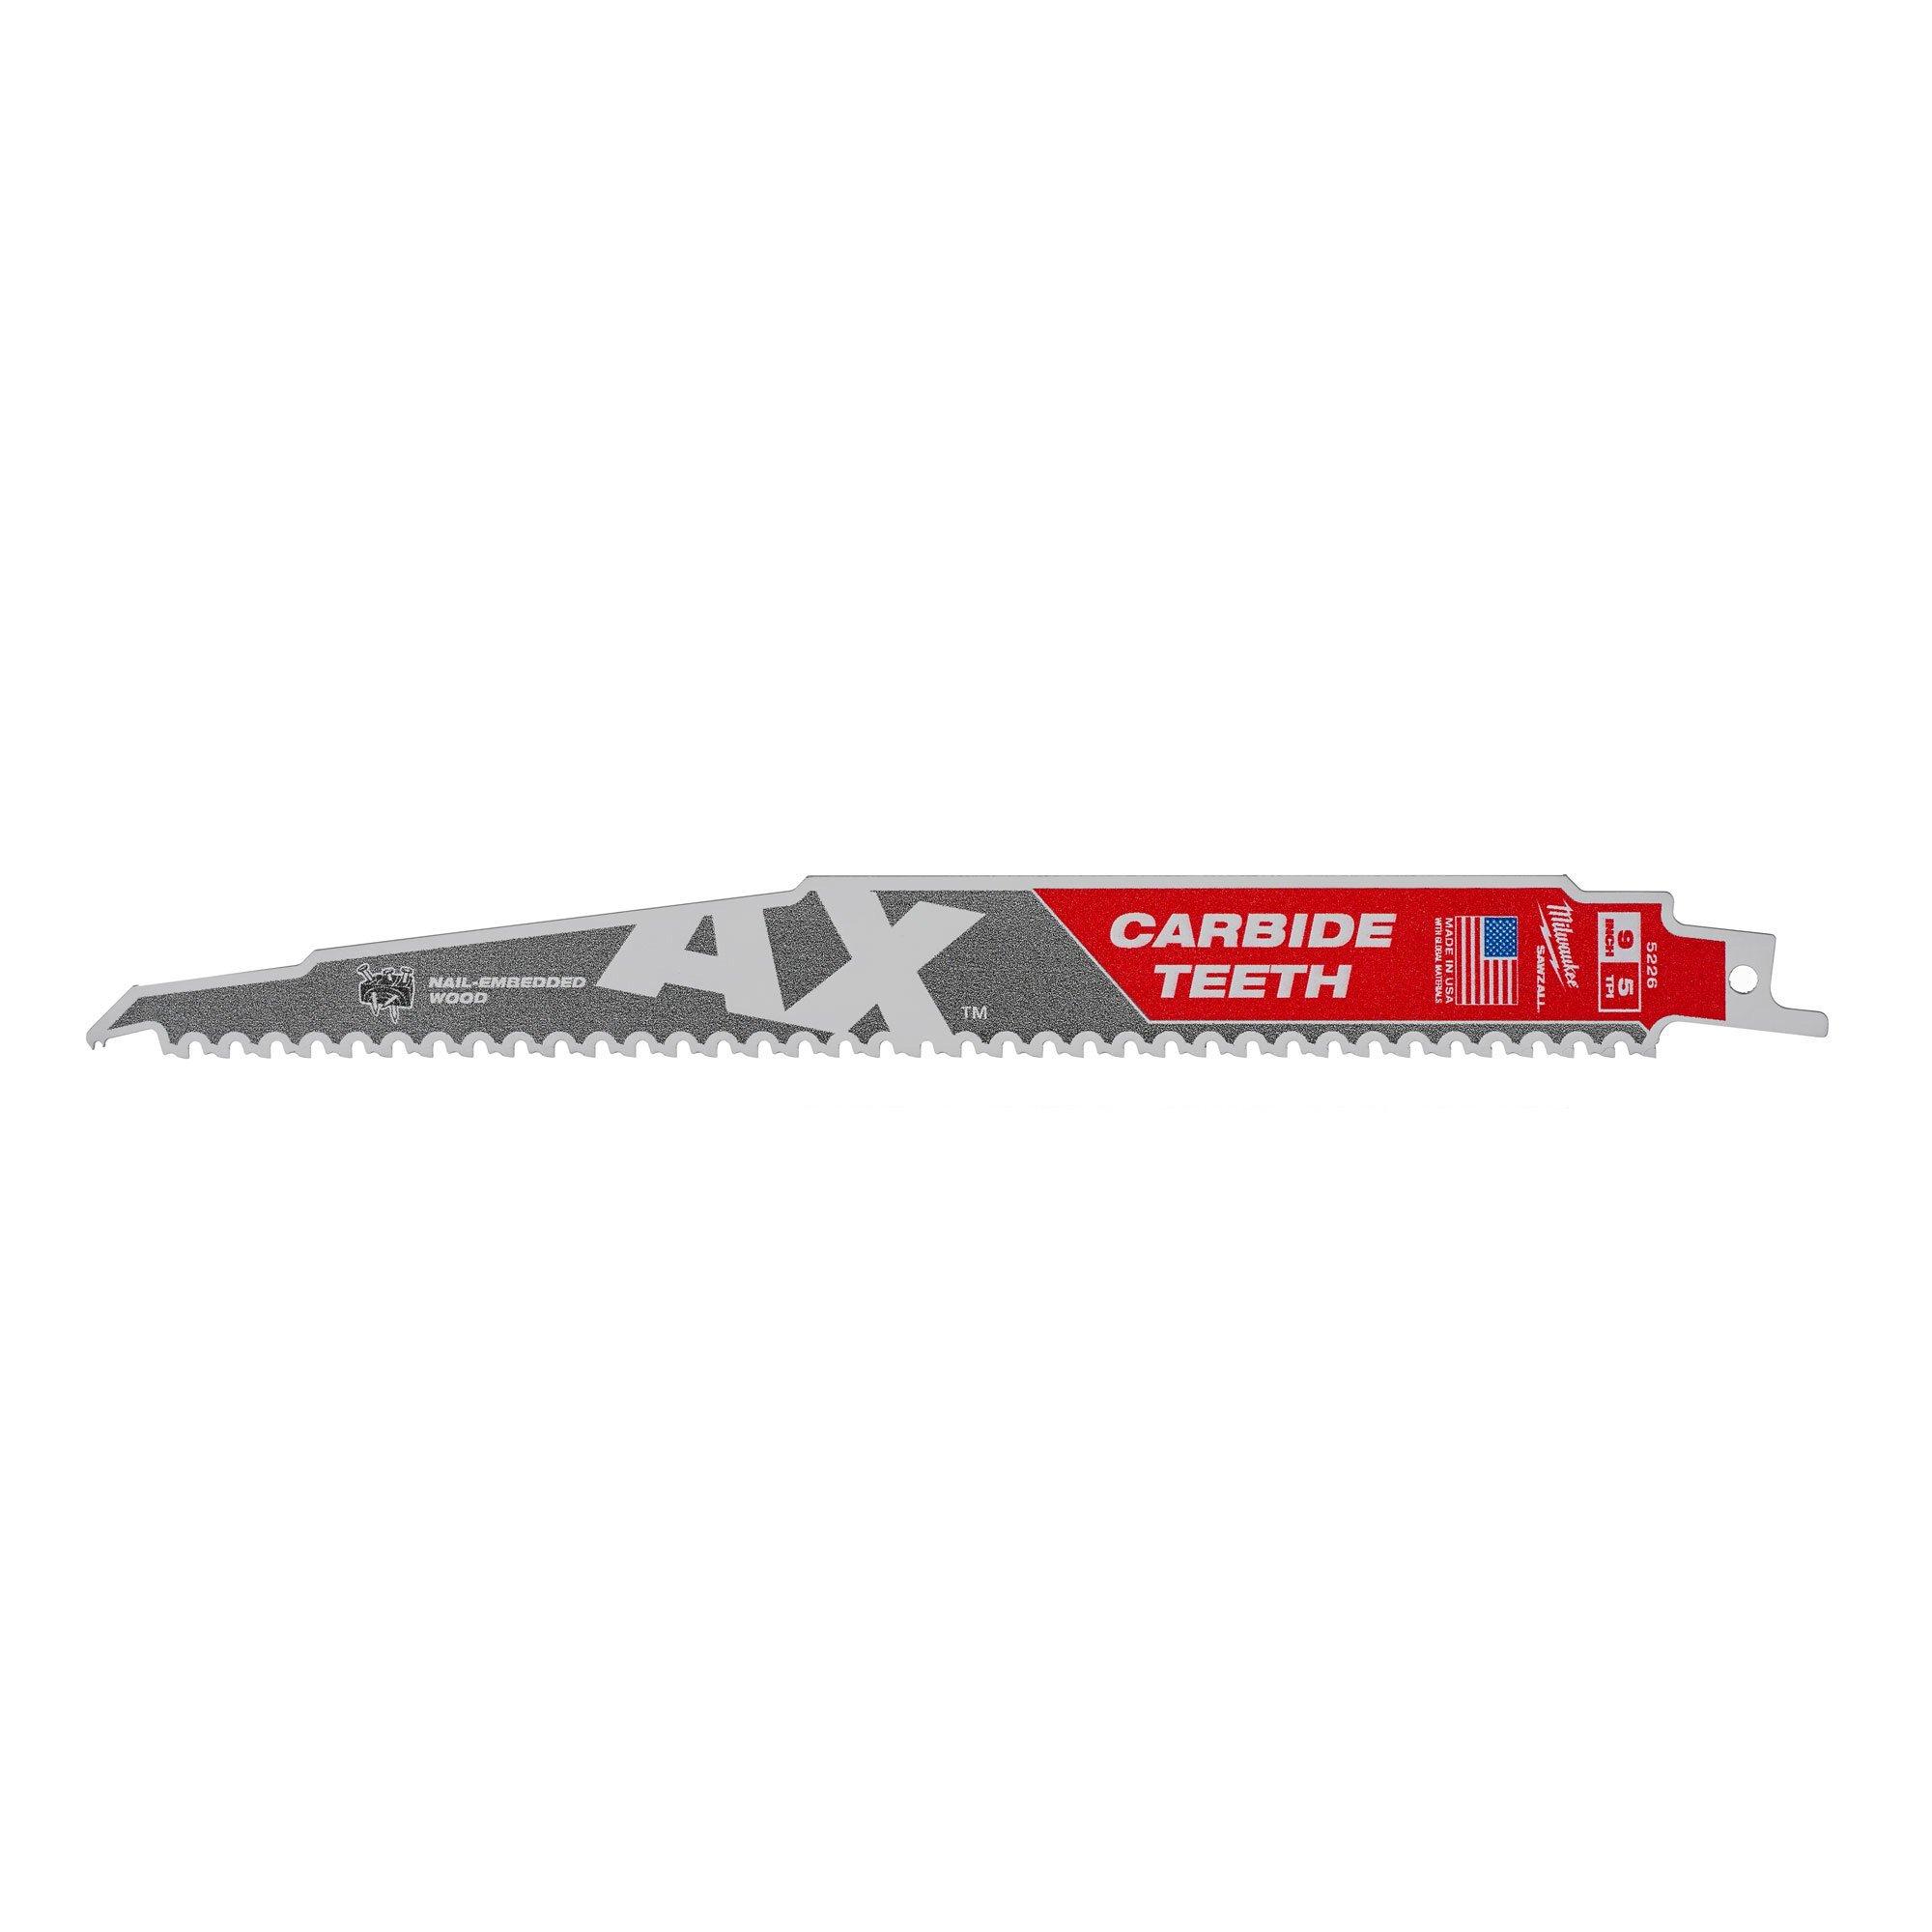 Milwaukee 48005713 230mm Heavy Duty Sawzall Demolition Blade 10 TPI THE TORCH x5